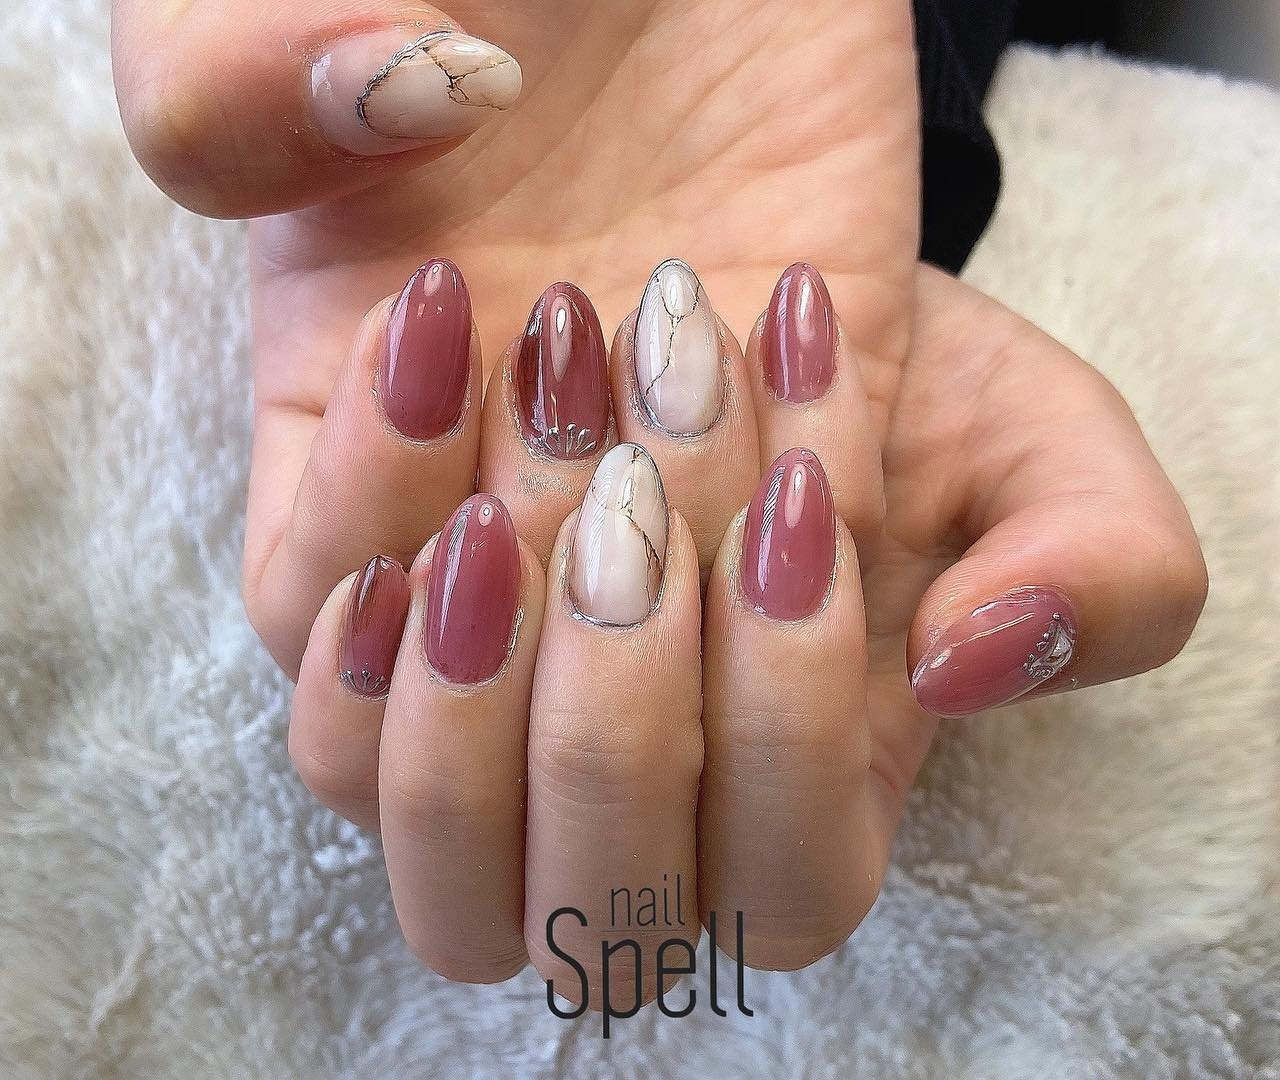 White stone💅 ︙ #gelnail#gel#nailspell#nailstagrame #nailsalonspell #nails #春ネイル#ネイル#手描きアート#ジェルネイル#ネイルデザイン#くすみピンクネイル#ネイルブック #kokoist#上田市ネイルサロン#stonenails #ニュアンスネイル#大理石ネイル #nailSpell_azusa #ネイルブック